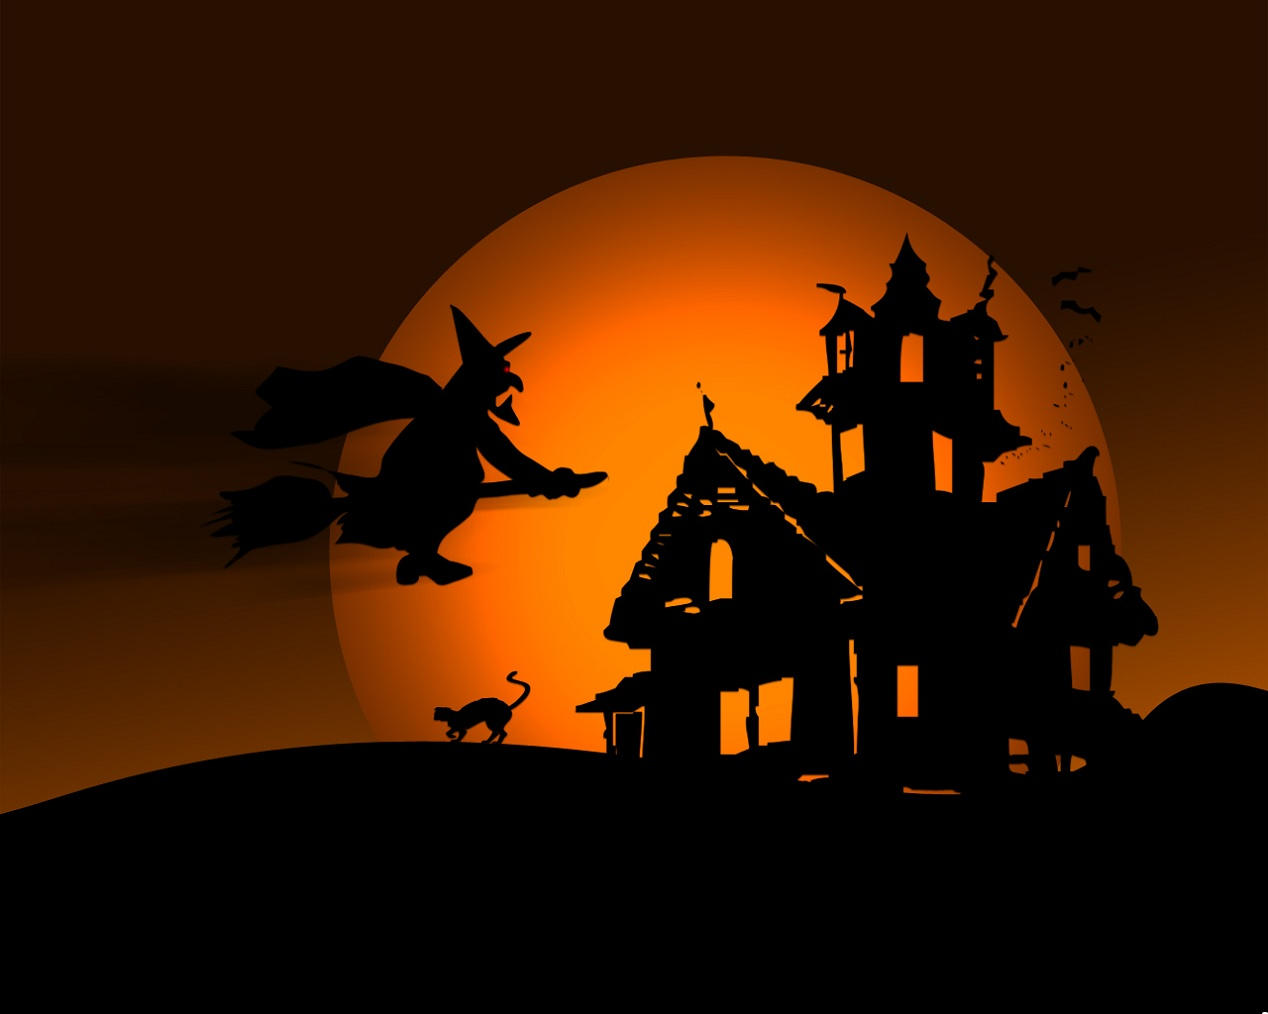 tinkerbell-halloween-backgrounds